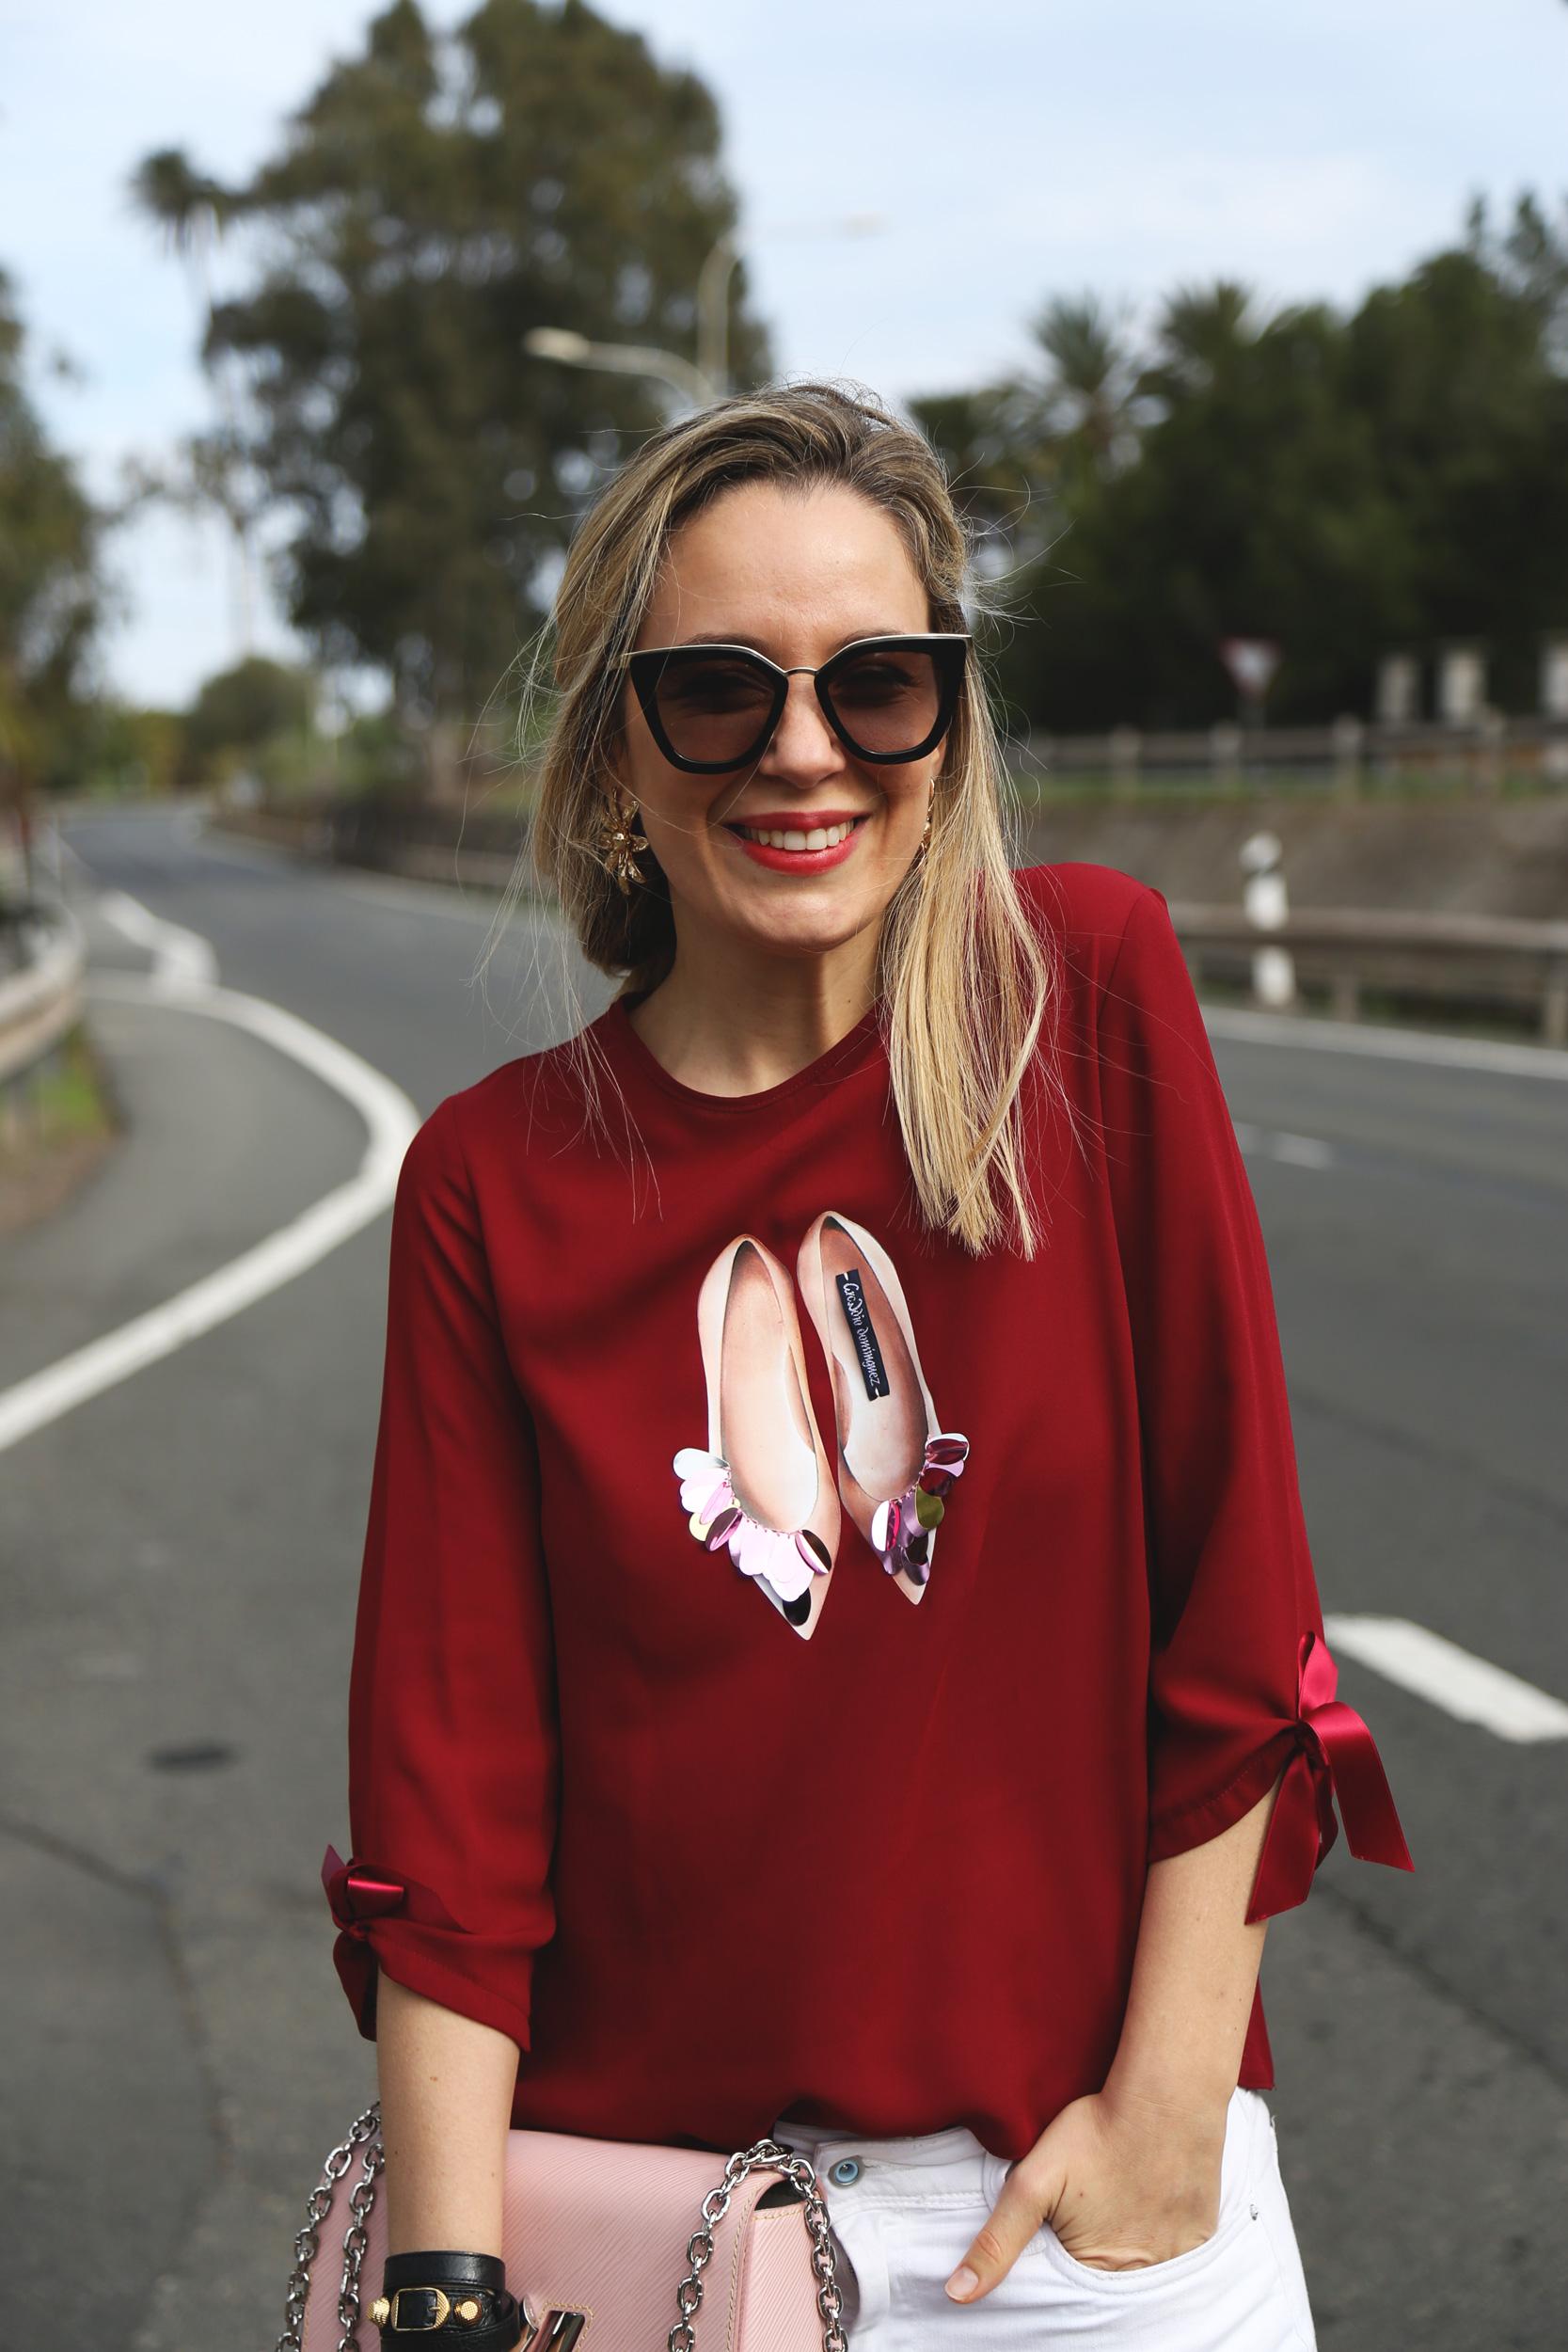 Priscila blogger de moda